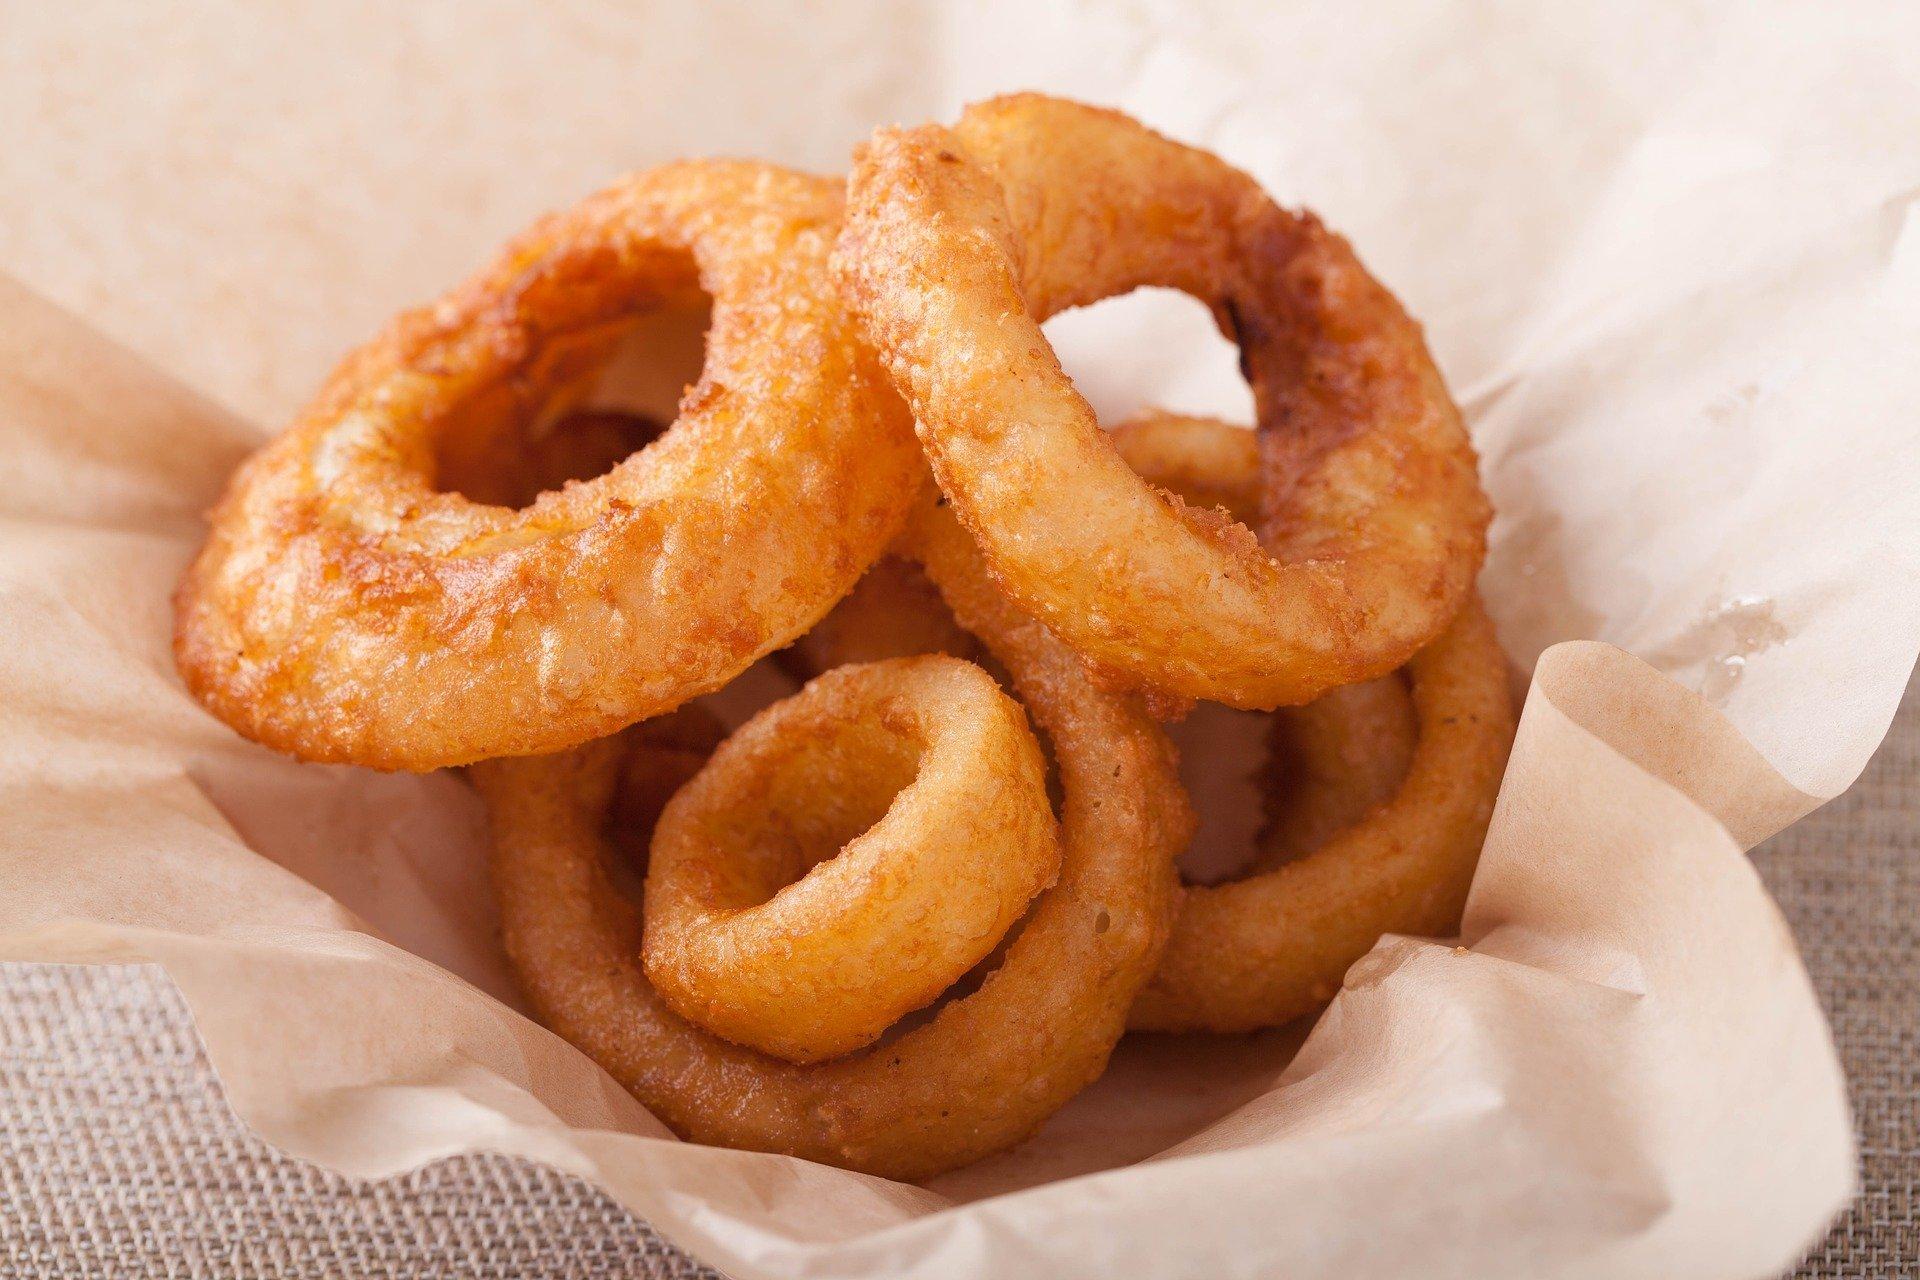 Fried onion.   Source: Pixabay